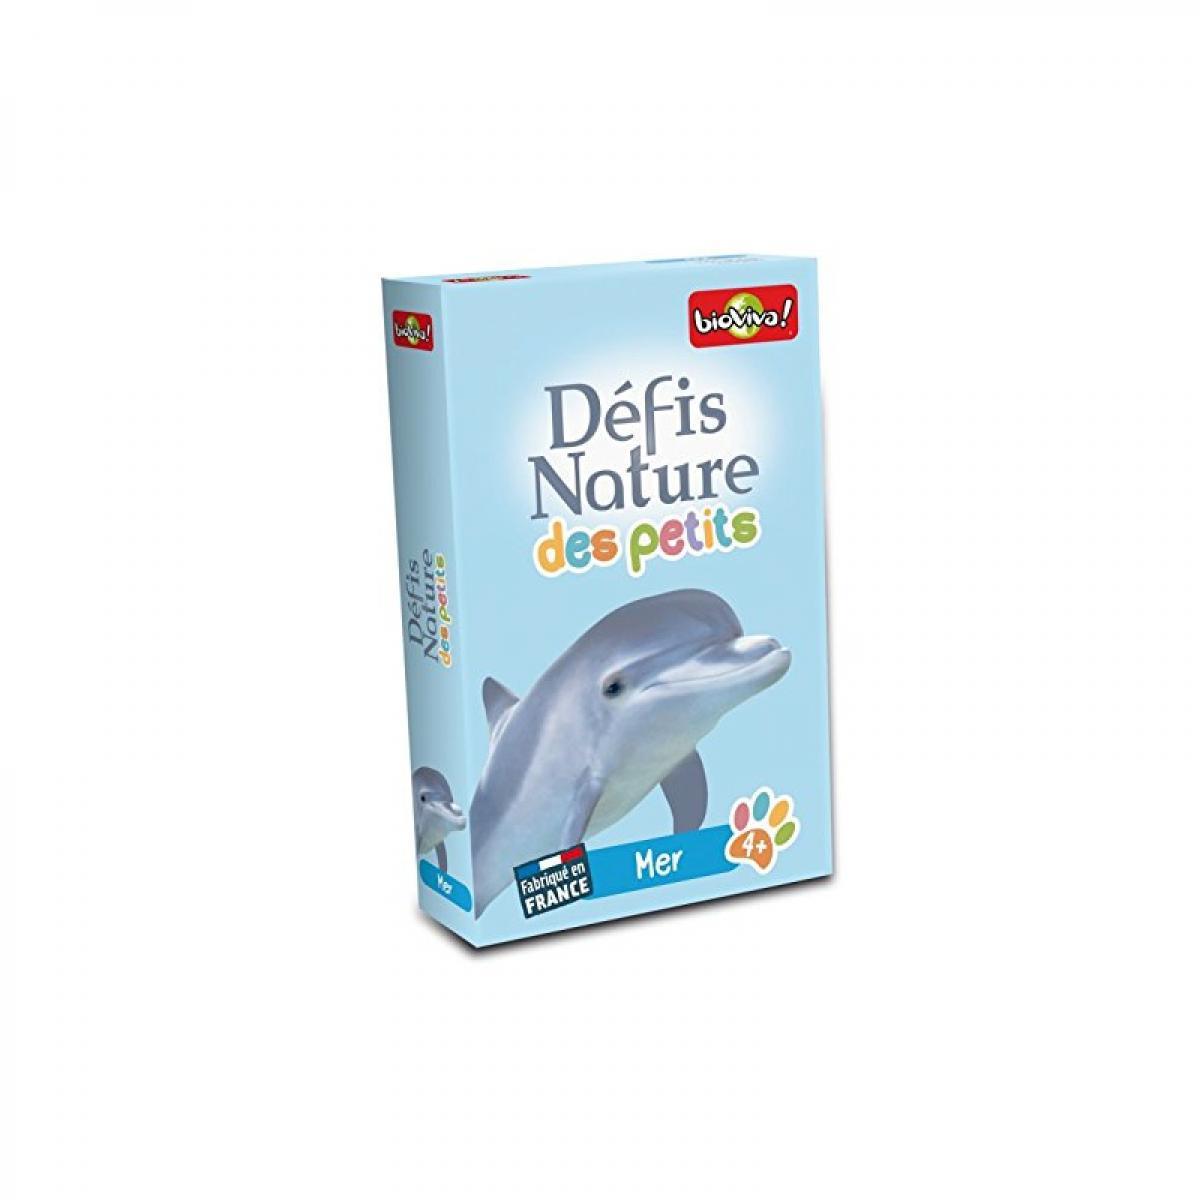 Bioviva Defis Nature Des Petits Mer